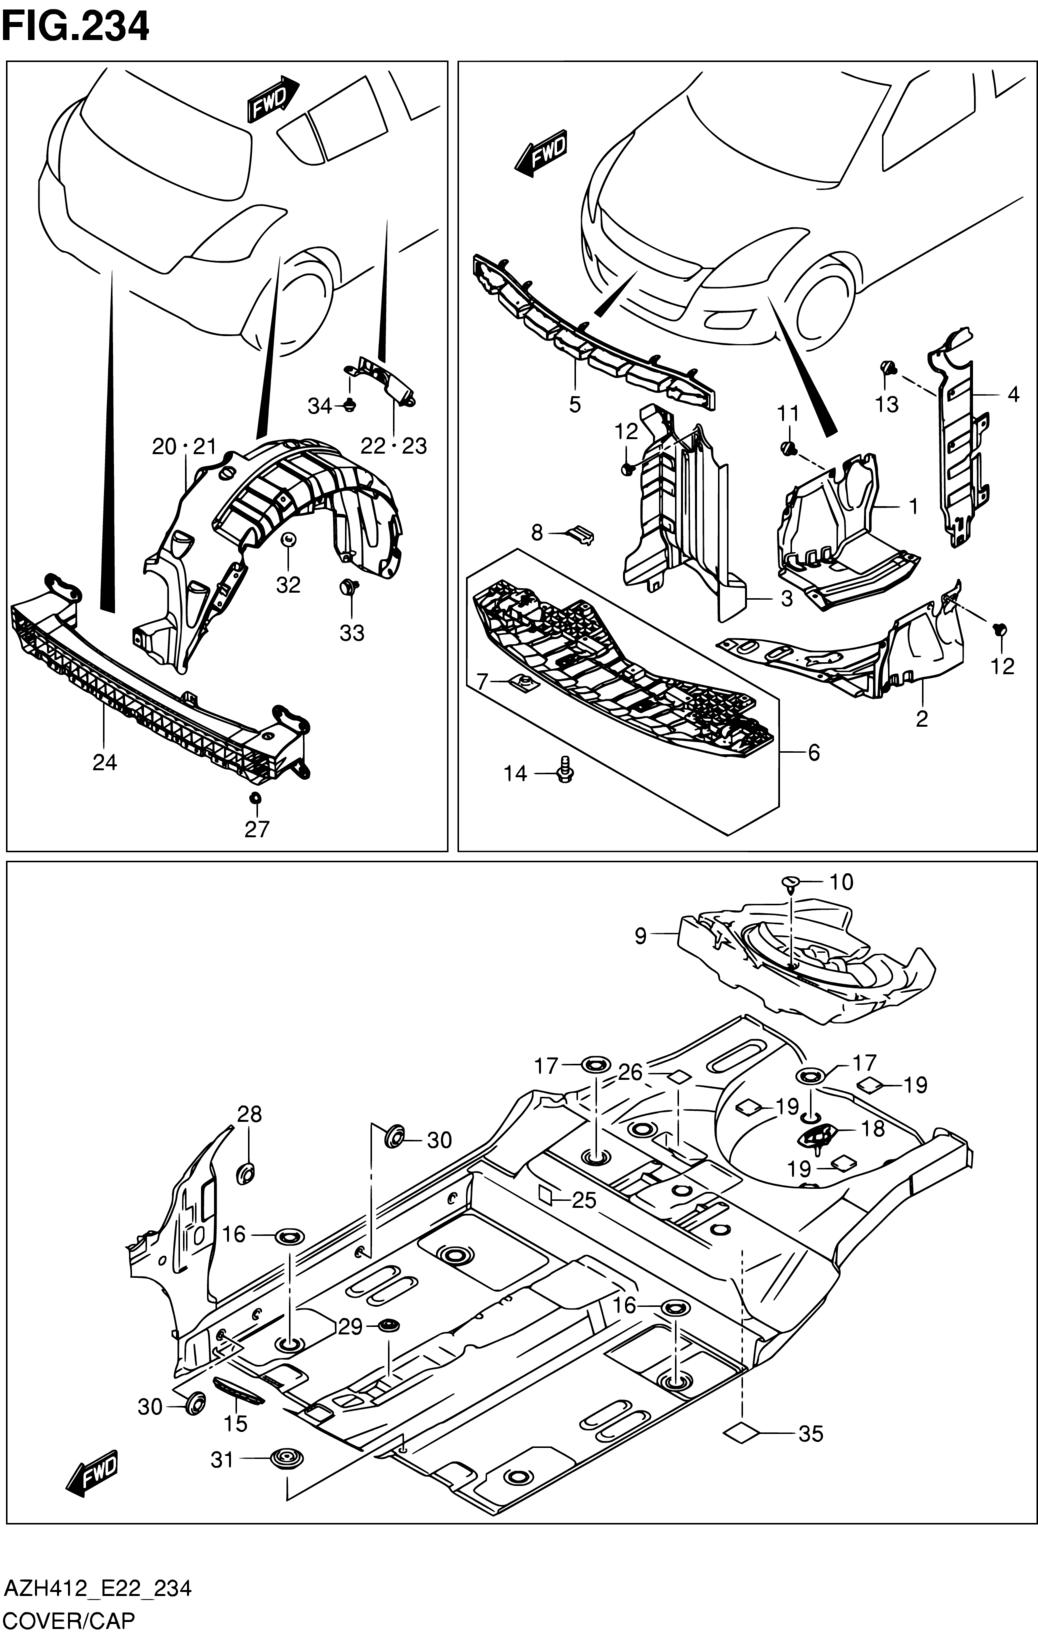 Middle East, Swift, AZH412 (E22), Body, 234 - COVER/CAP - Catcar info